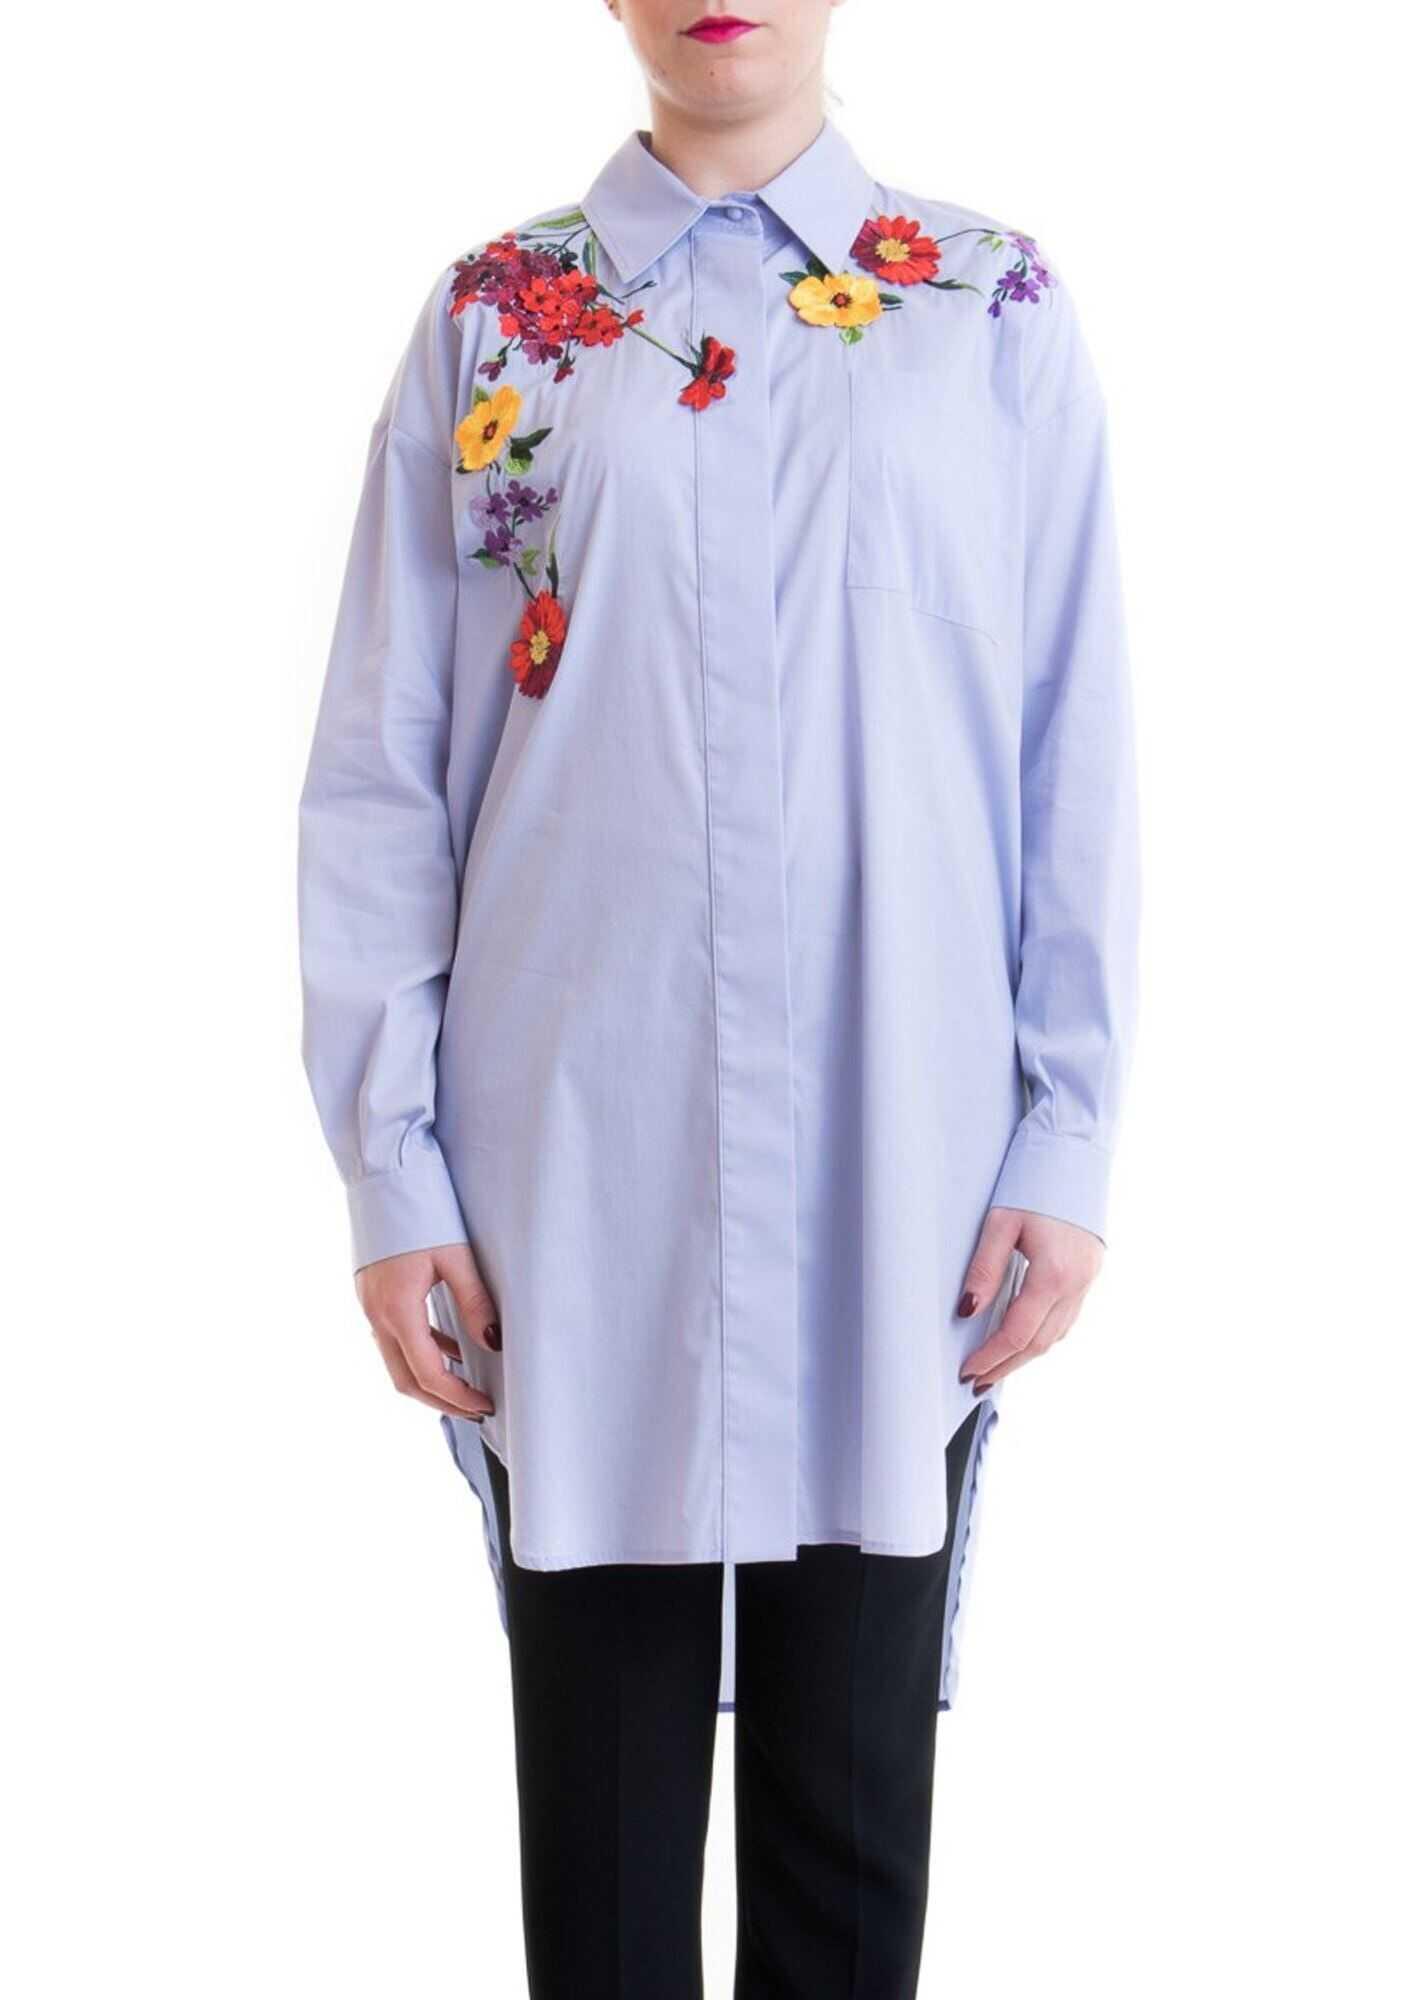 Blumarine Flowers Embroidery Oversized Shirt Light Blue